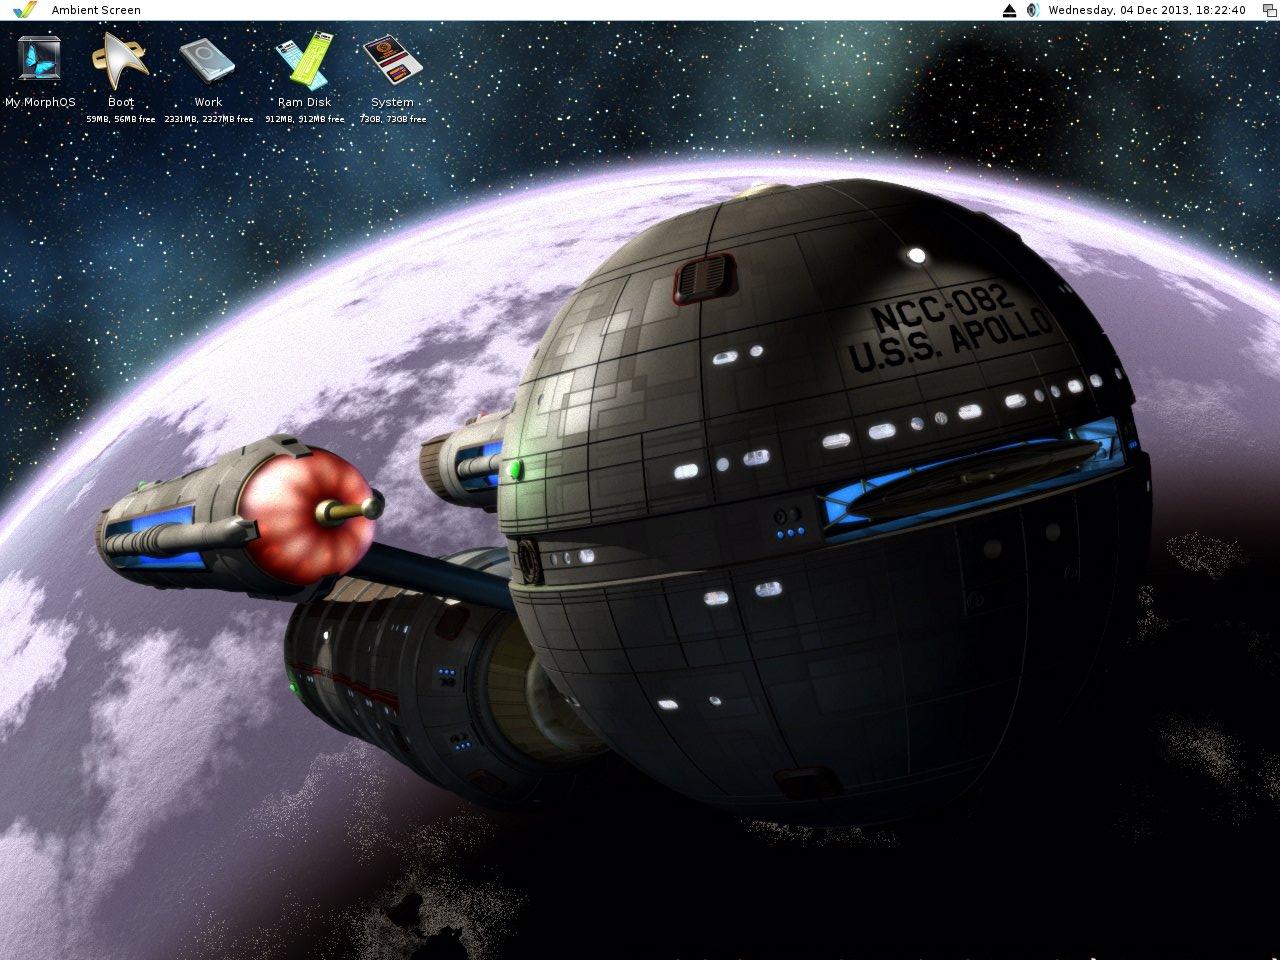 My Trek MorphOS desktop